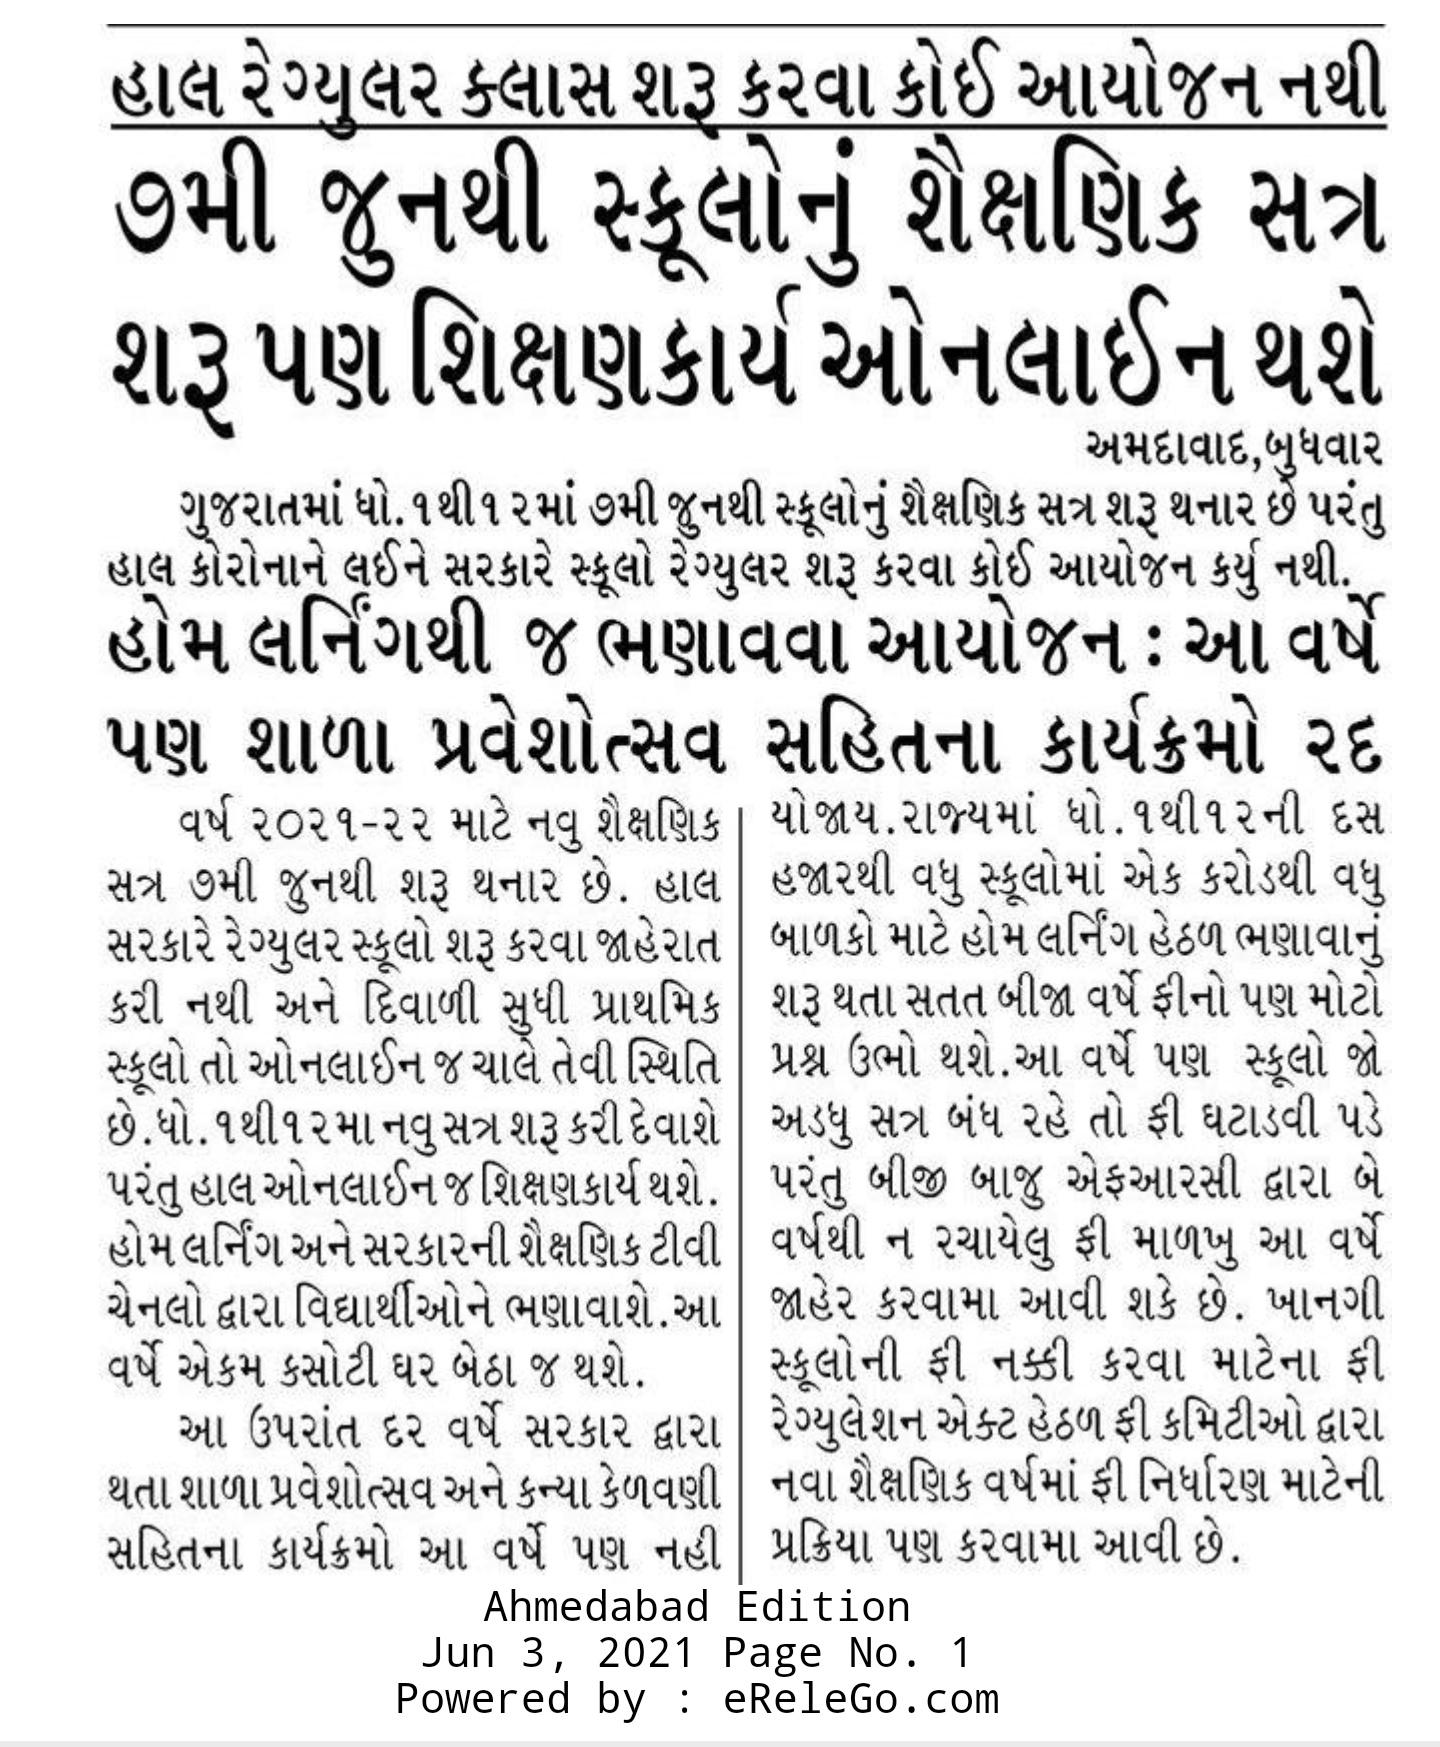 http://www.pravinvankar.in/2021/05/shala-vidyarthi-na-shixan-mate-kulashe.html